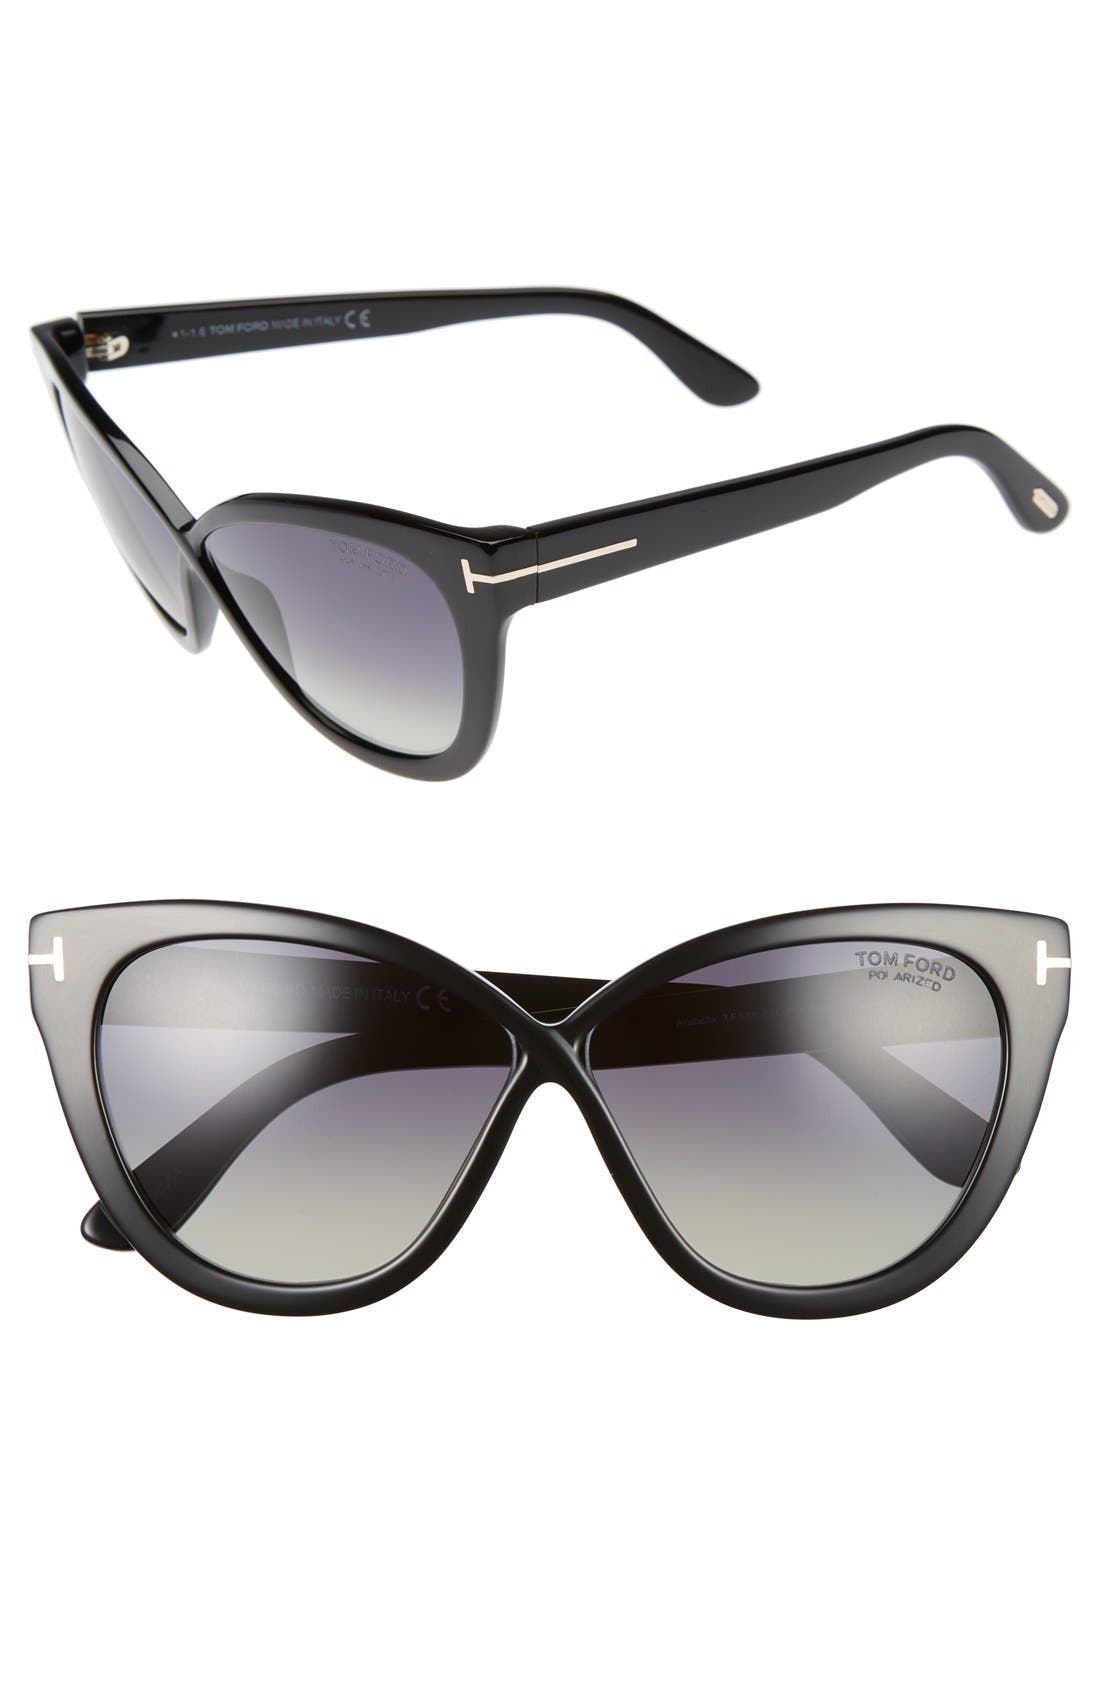 Main Image - Tom Ford Arabella 59mm Cat Eye Sunglasses